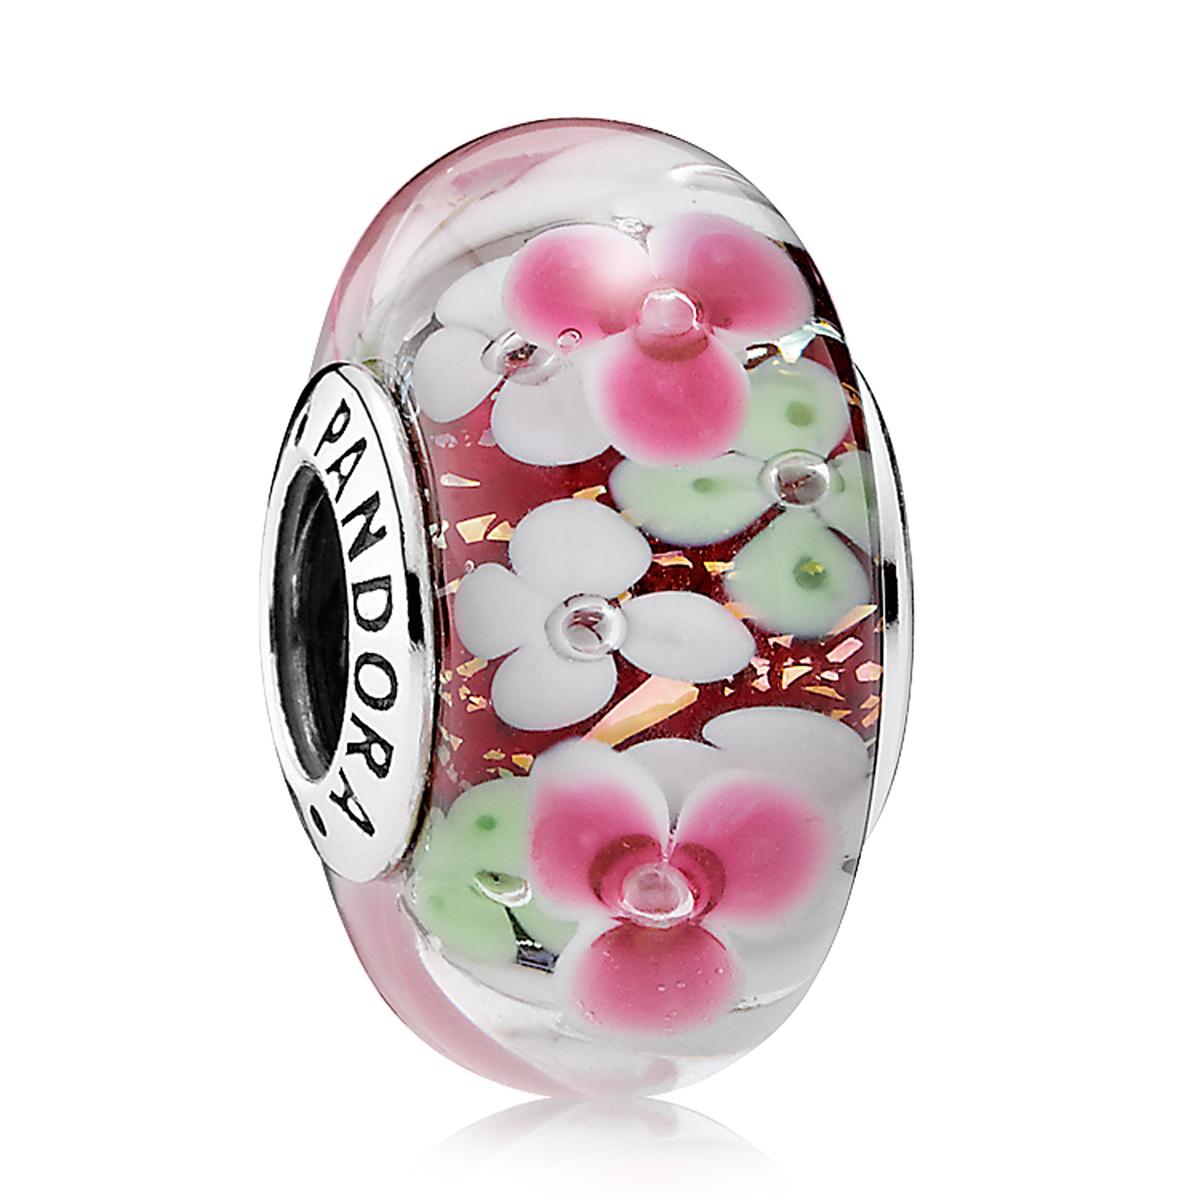 Pandora murano glass charms pancharmbracelets pandora flower garden murano glass izmirmasajfo